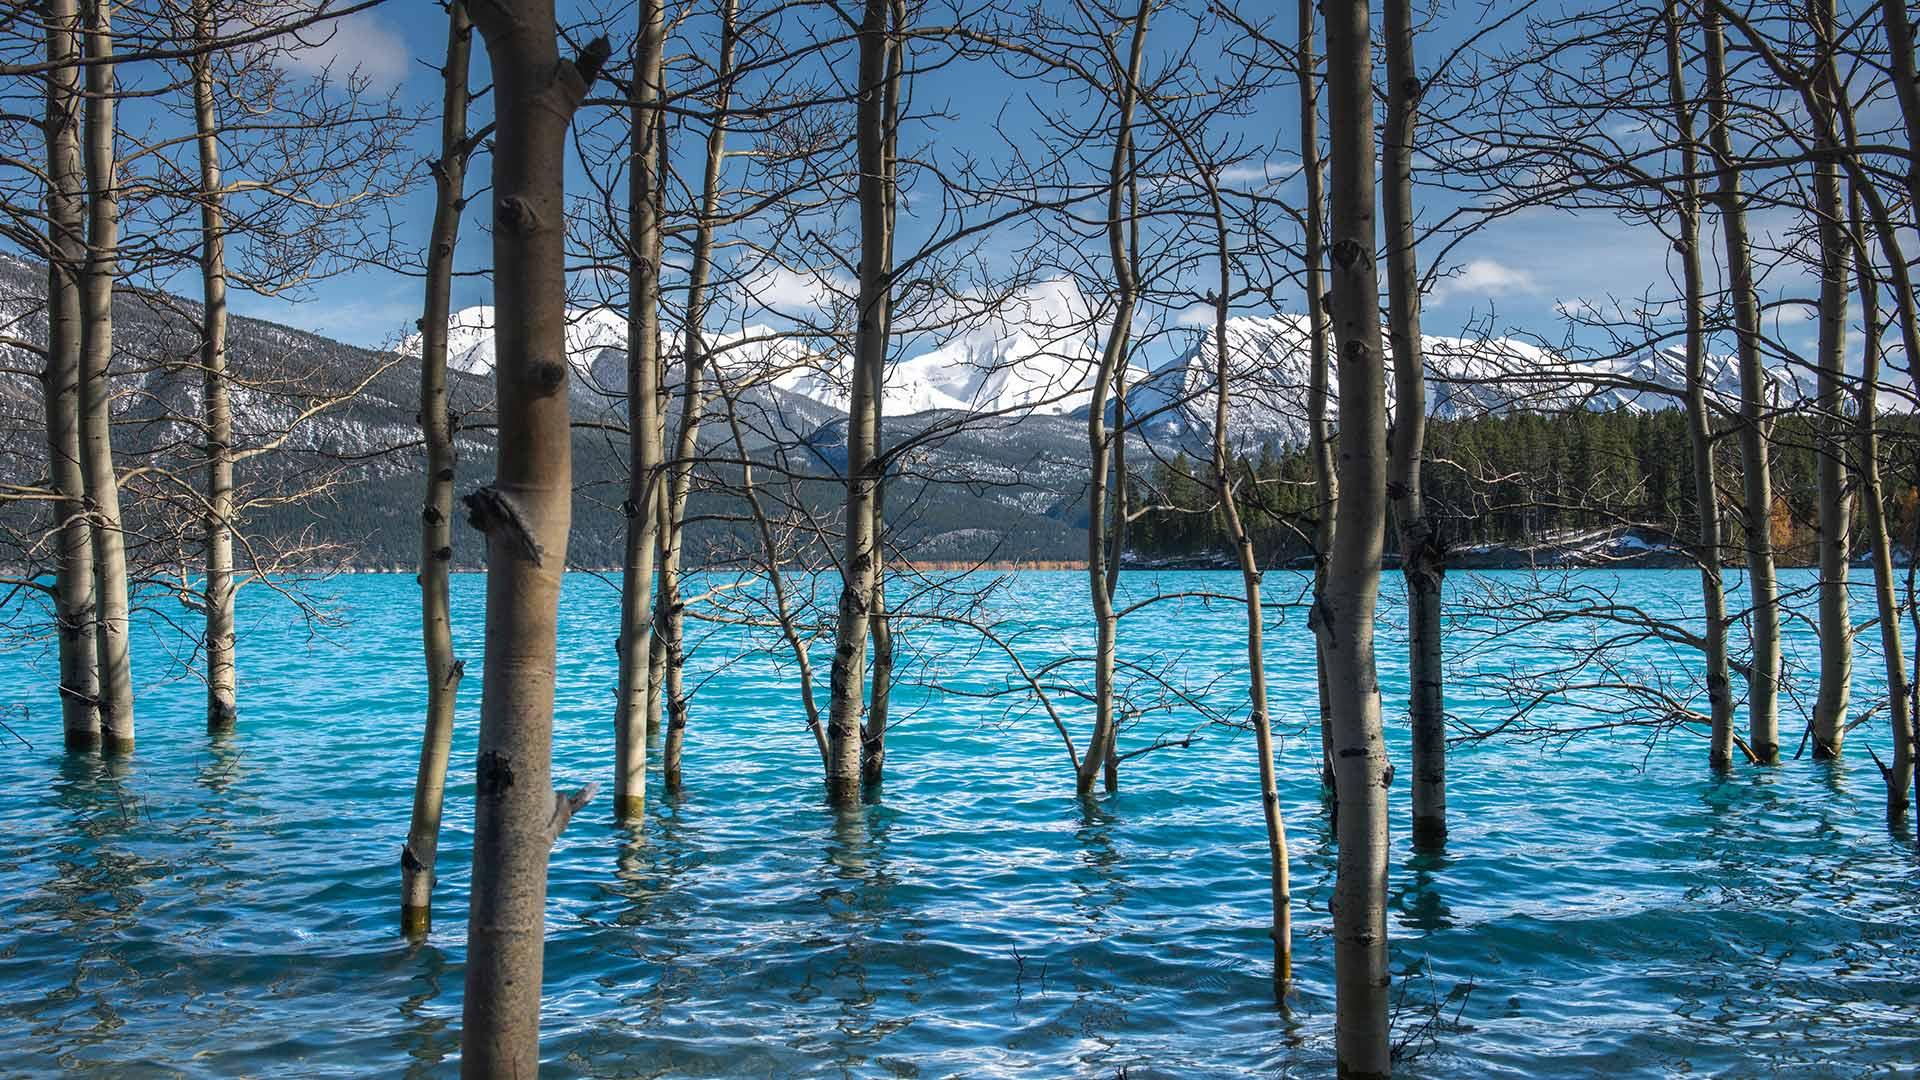 亚伯拉罕湖中的树,加拿大艾伯塔 (© Coolbiere/Getty Images)